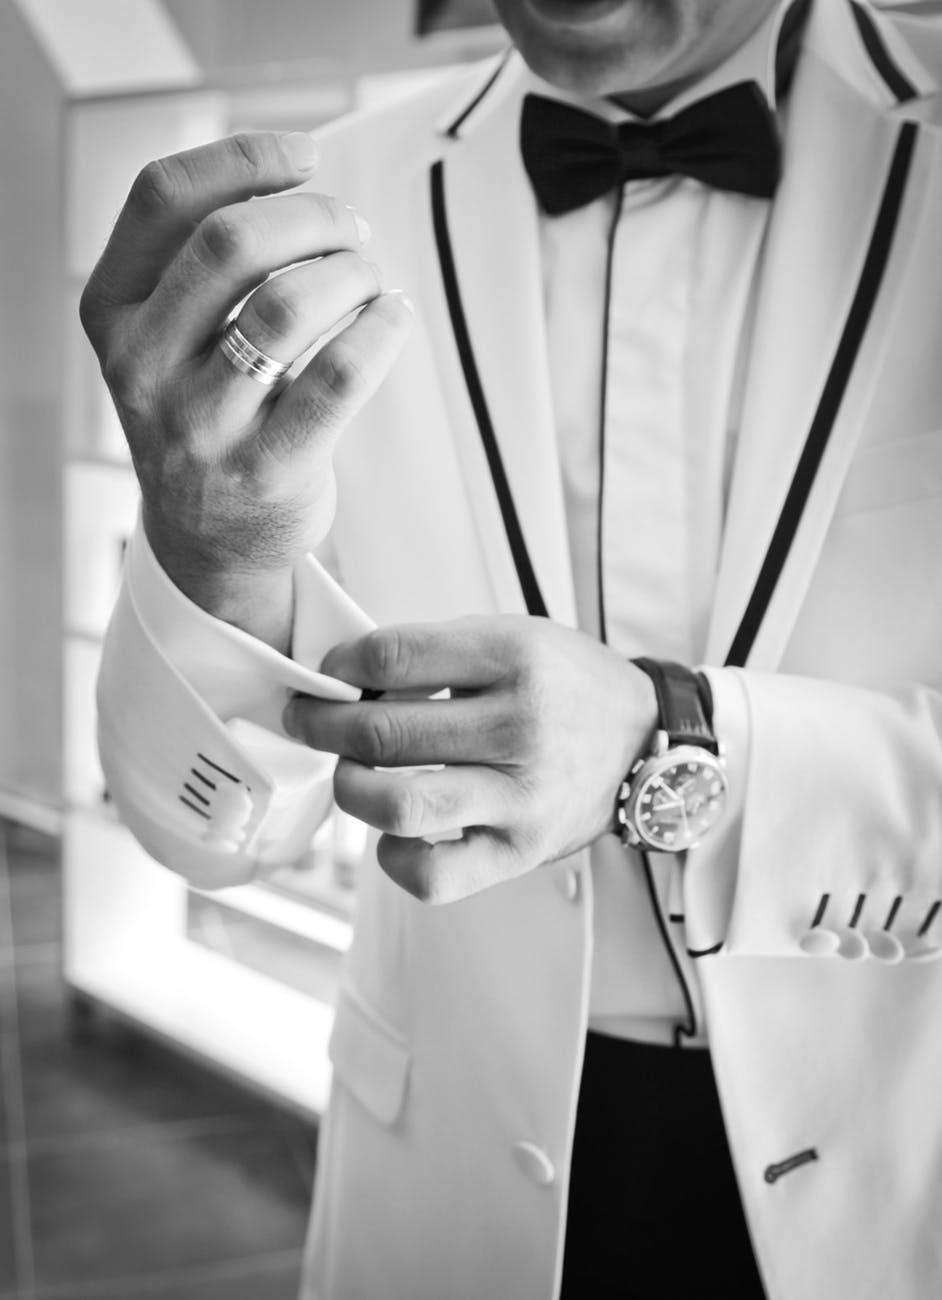 man wearing tuxedo in grayscale photography